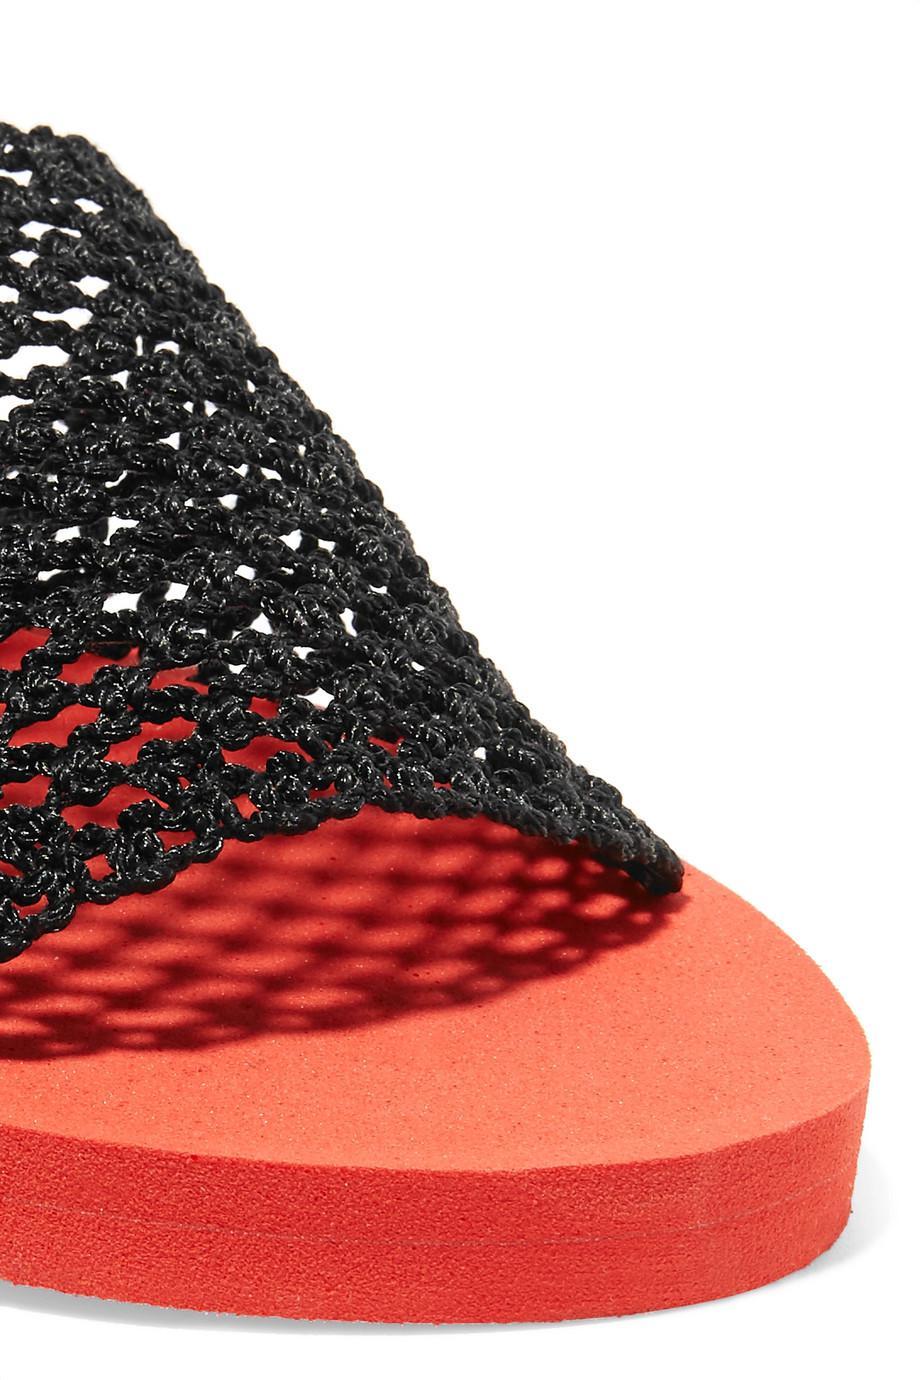 Ganni Liva Crocheted Slides Discount High Quality YtoCv